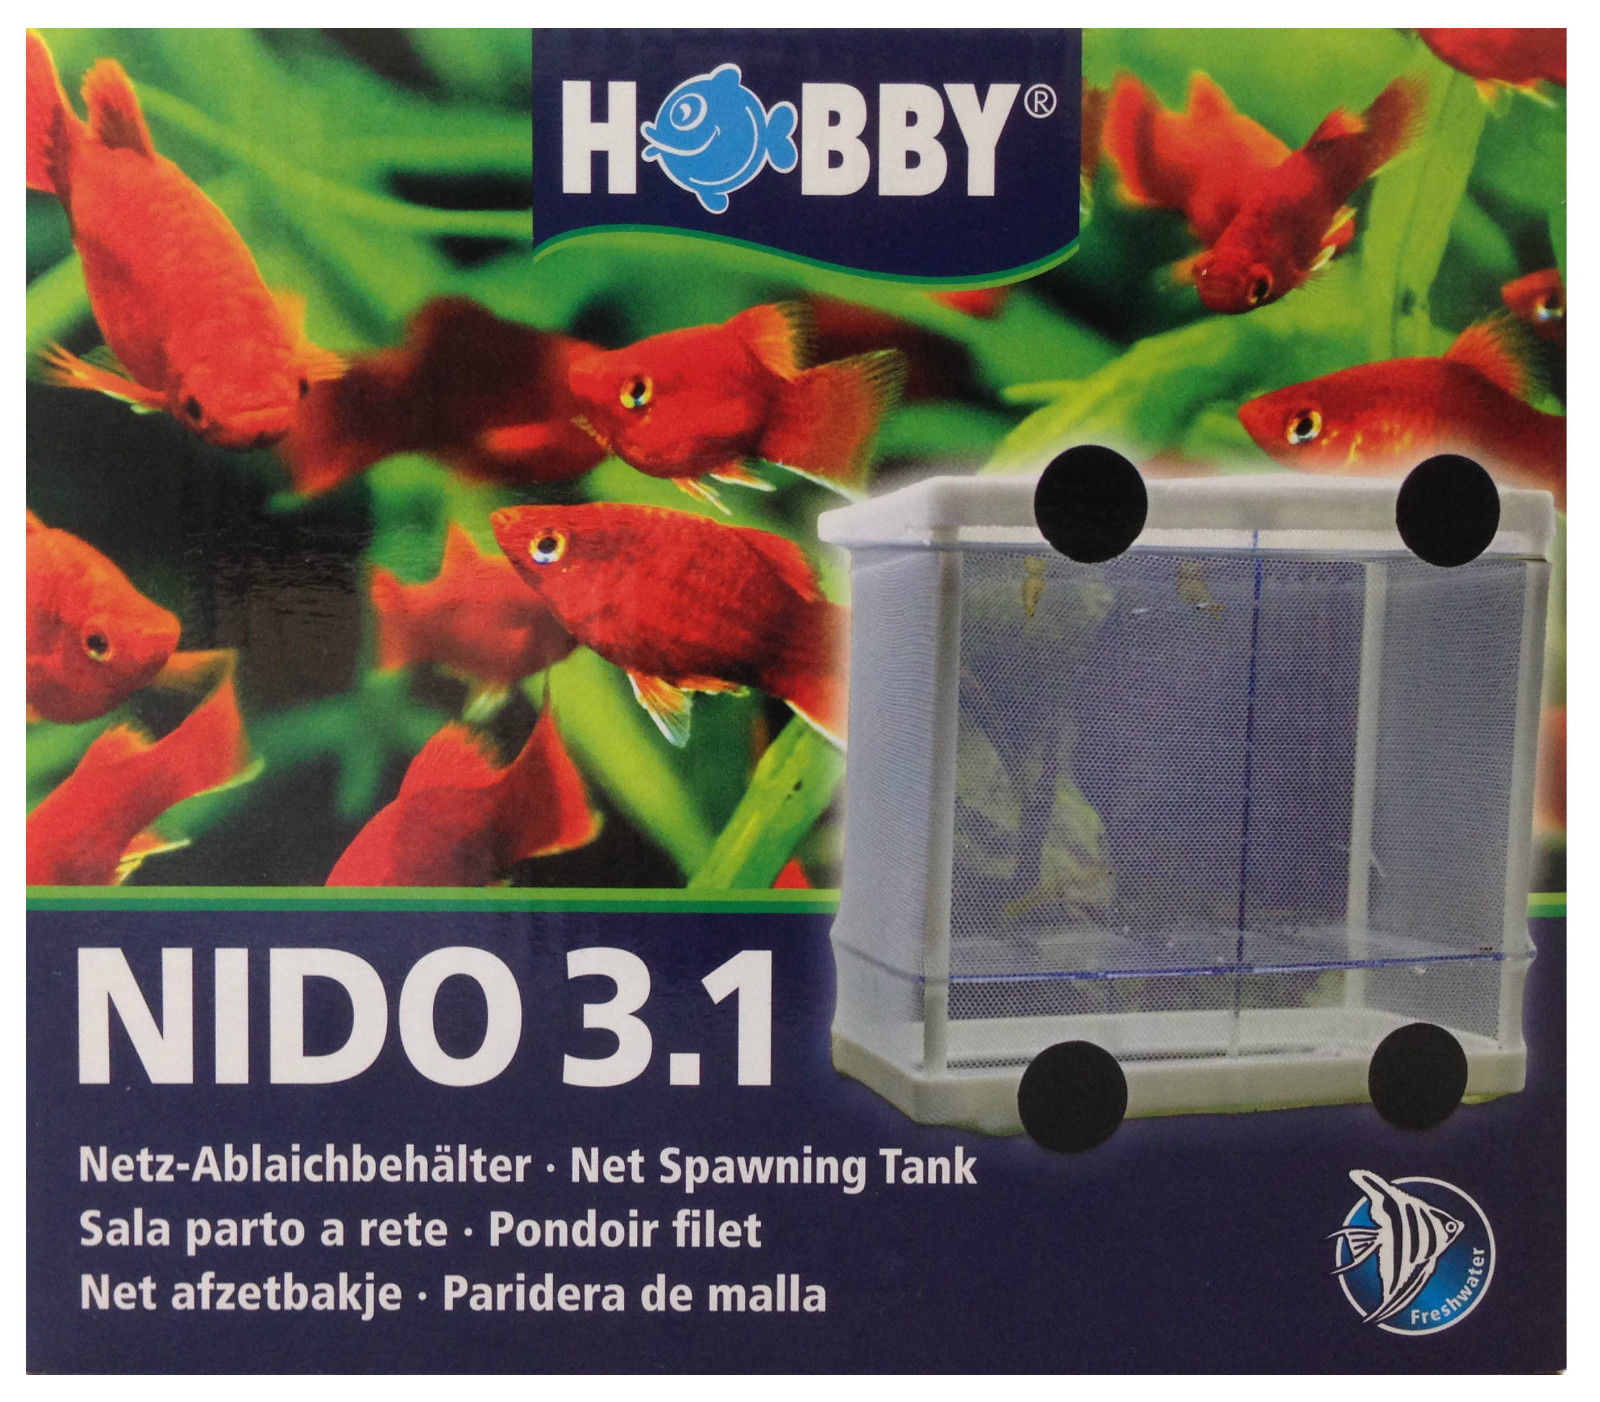 Aquarium fish tank fry net breeder breeding hatchery - Hobby Nido Breeding Tank Spawning Hatchery Baby Fry Trap Net Aquarium Fish Tank